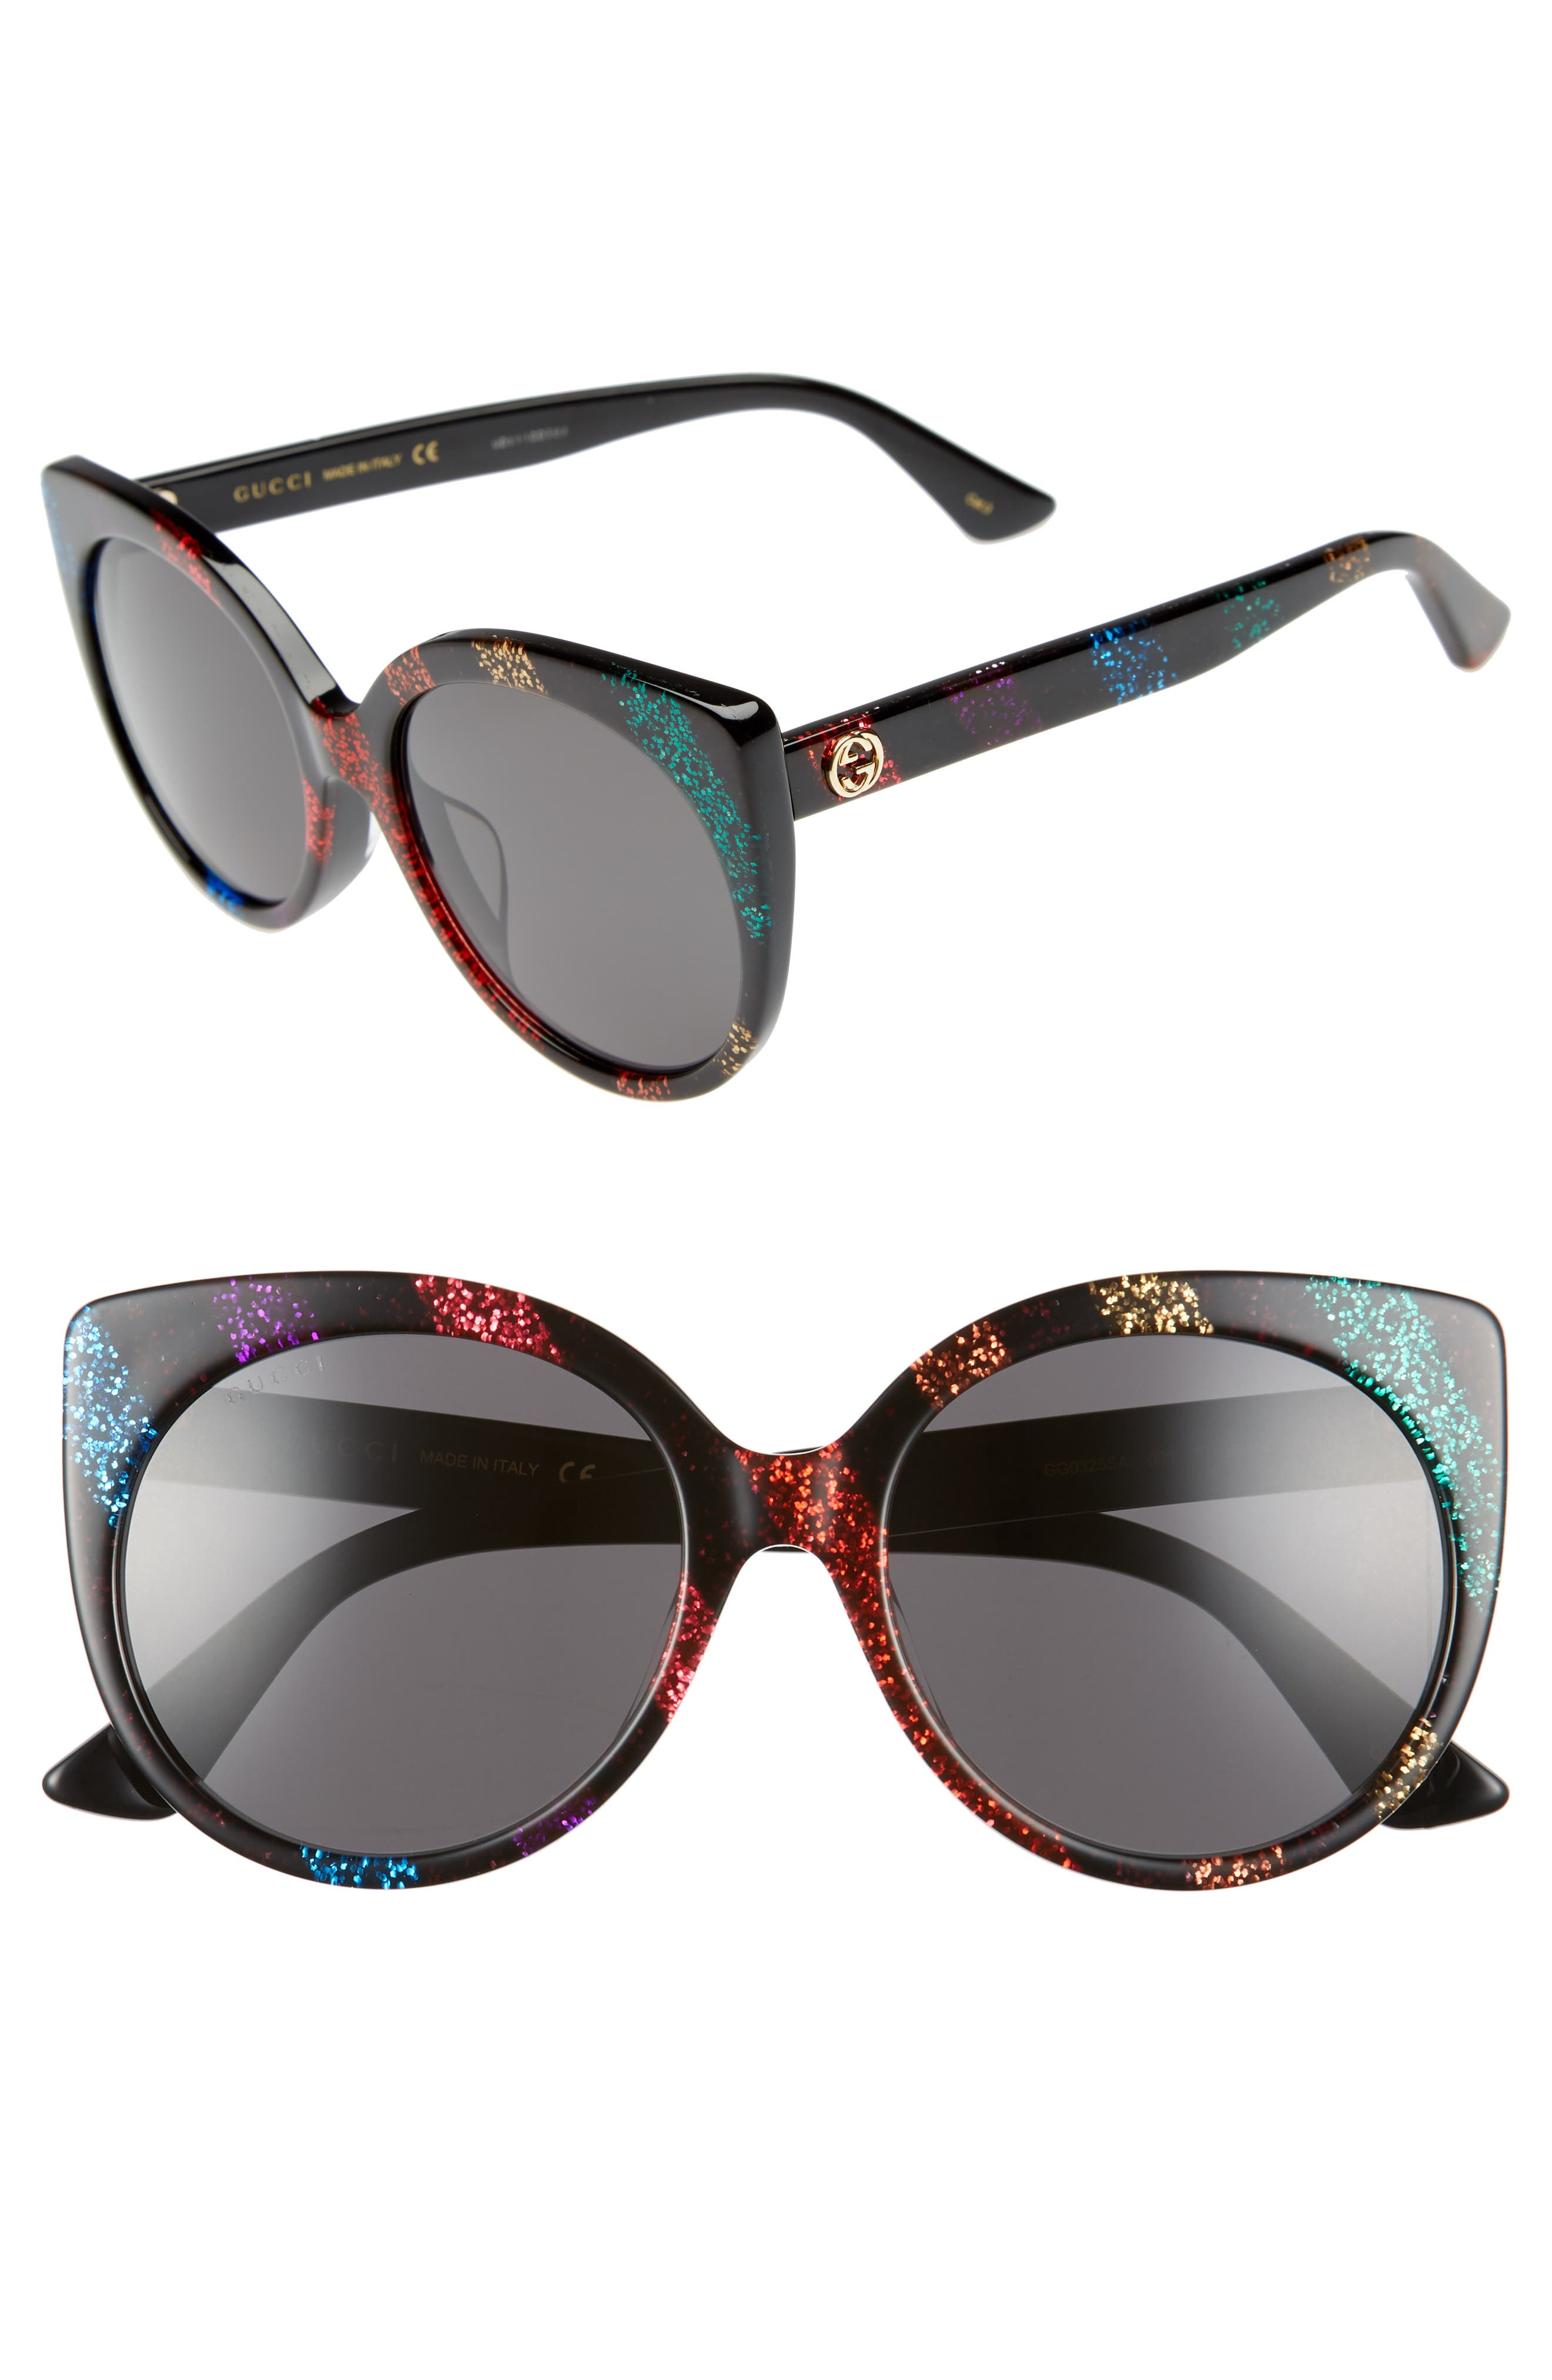 57mm Cat Eye Sunglasses,                         Main,                         color, 010